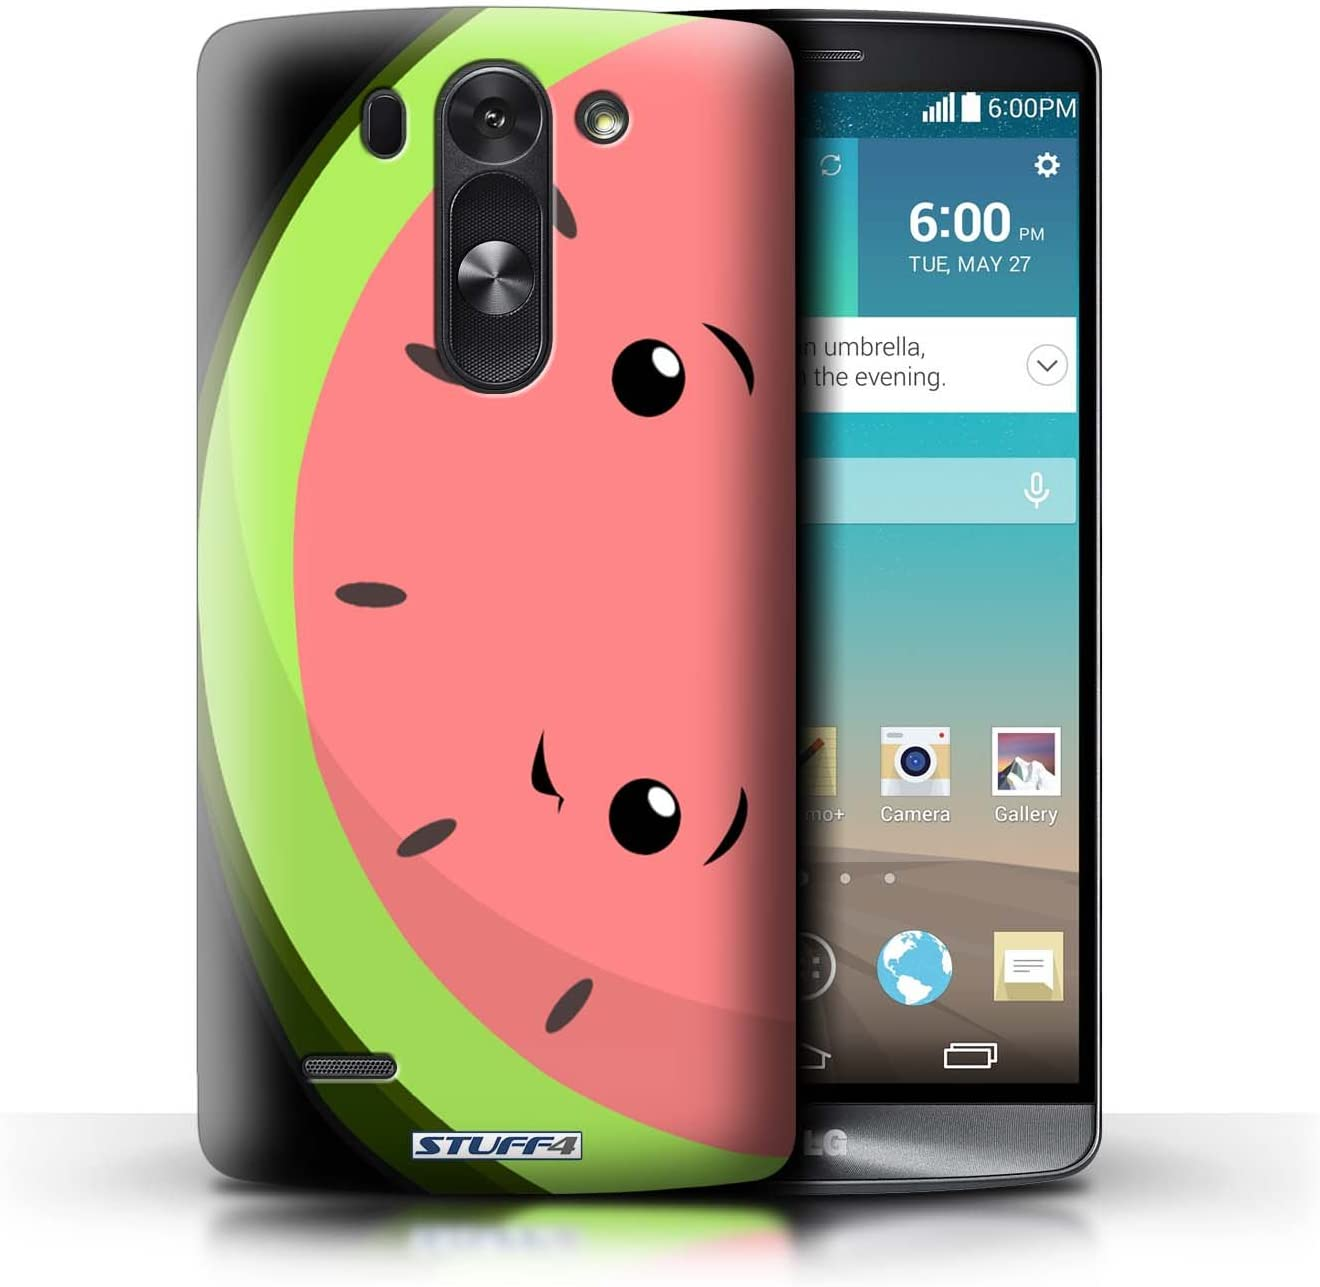 Phone Case for LG G3 Mini S/D722 Kawaii Food Watermelon Design Transparent Clear Ultra Slim Thin Hard Back Cover